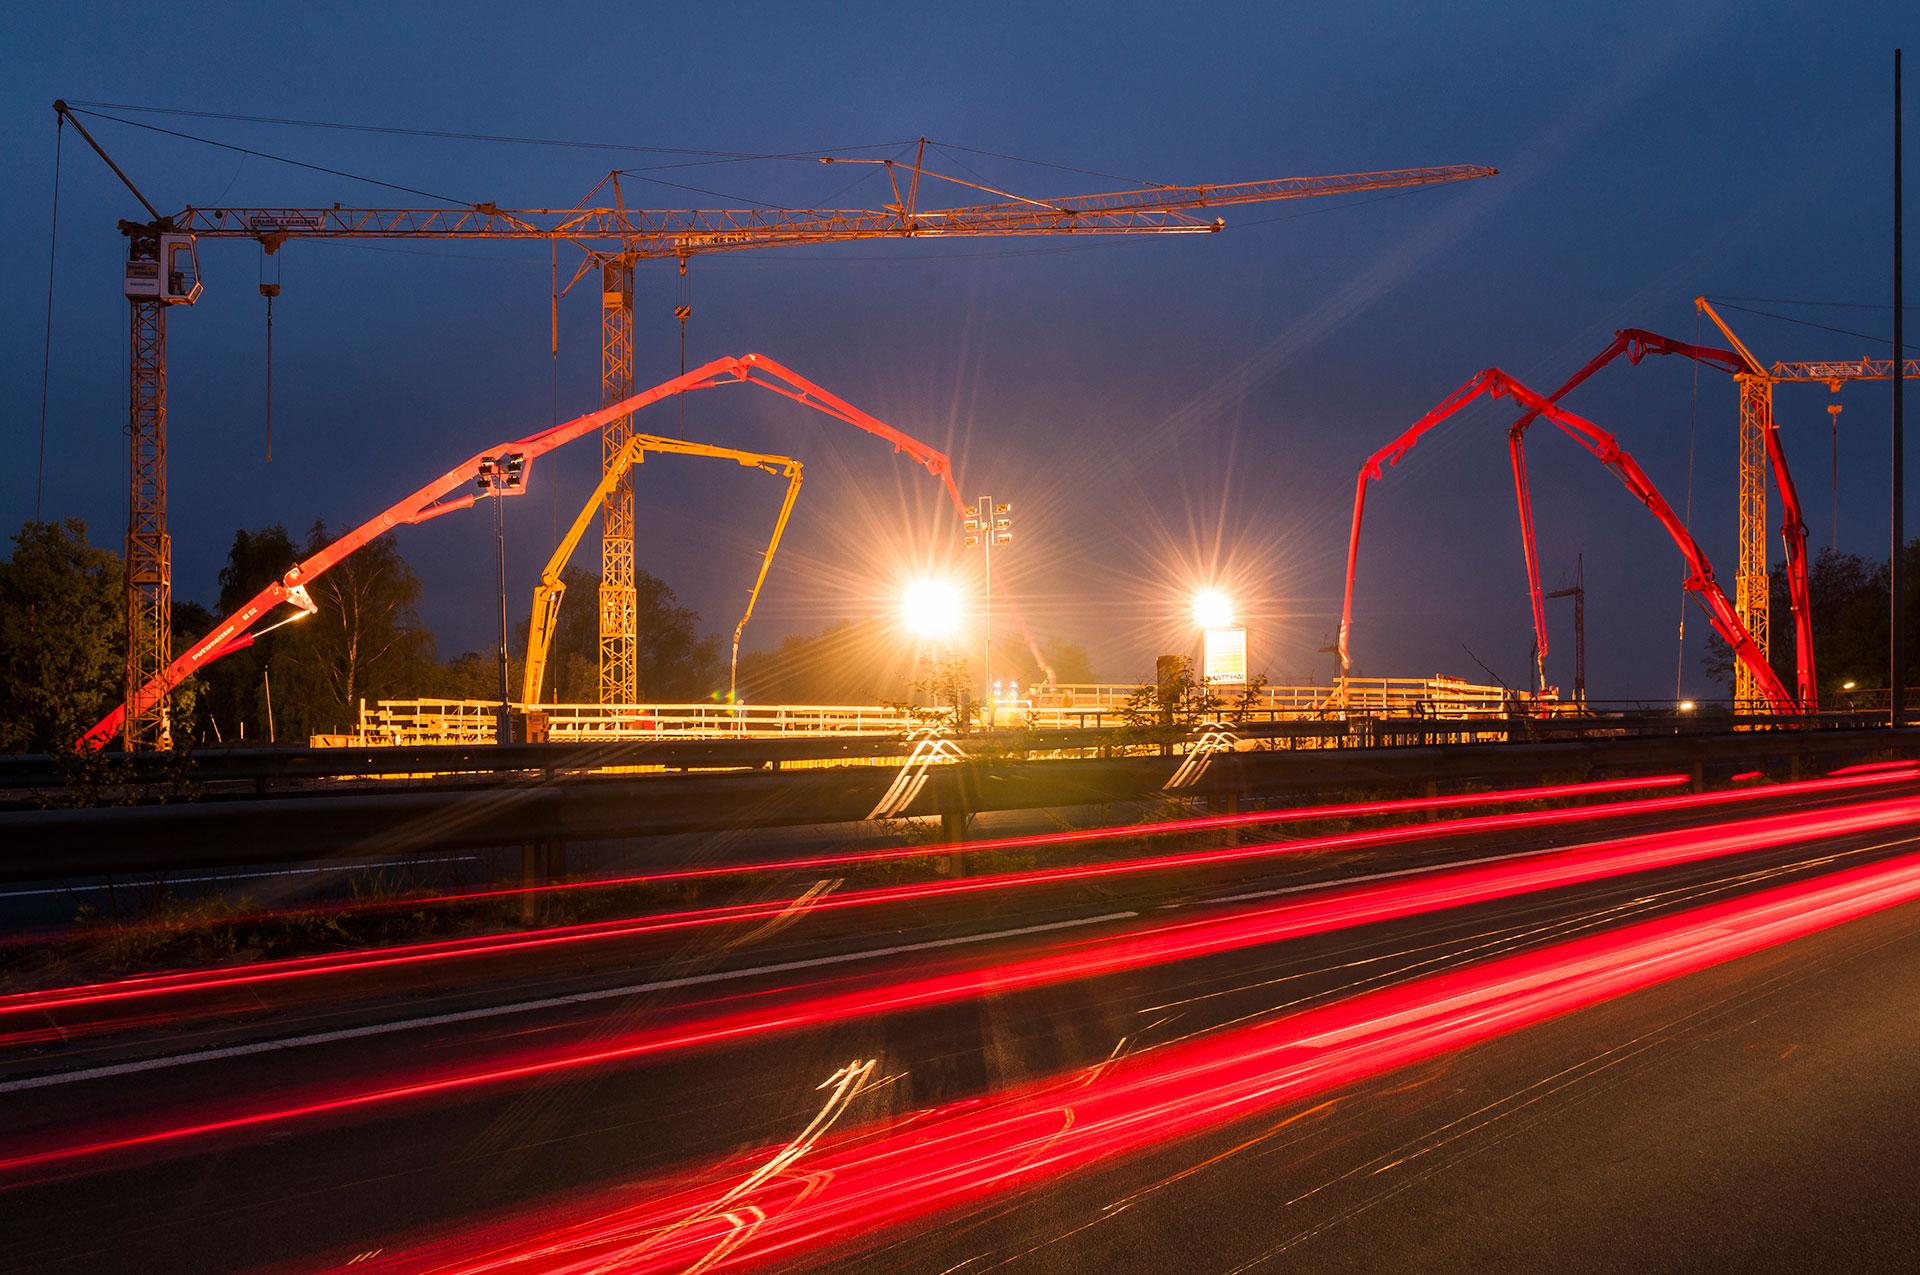 Concrete bridge construction-site at night